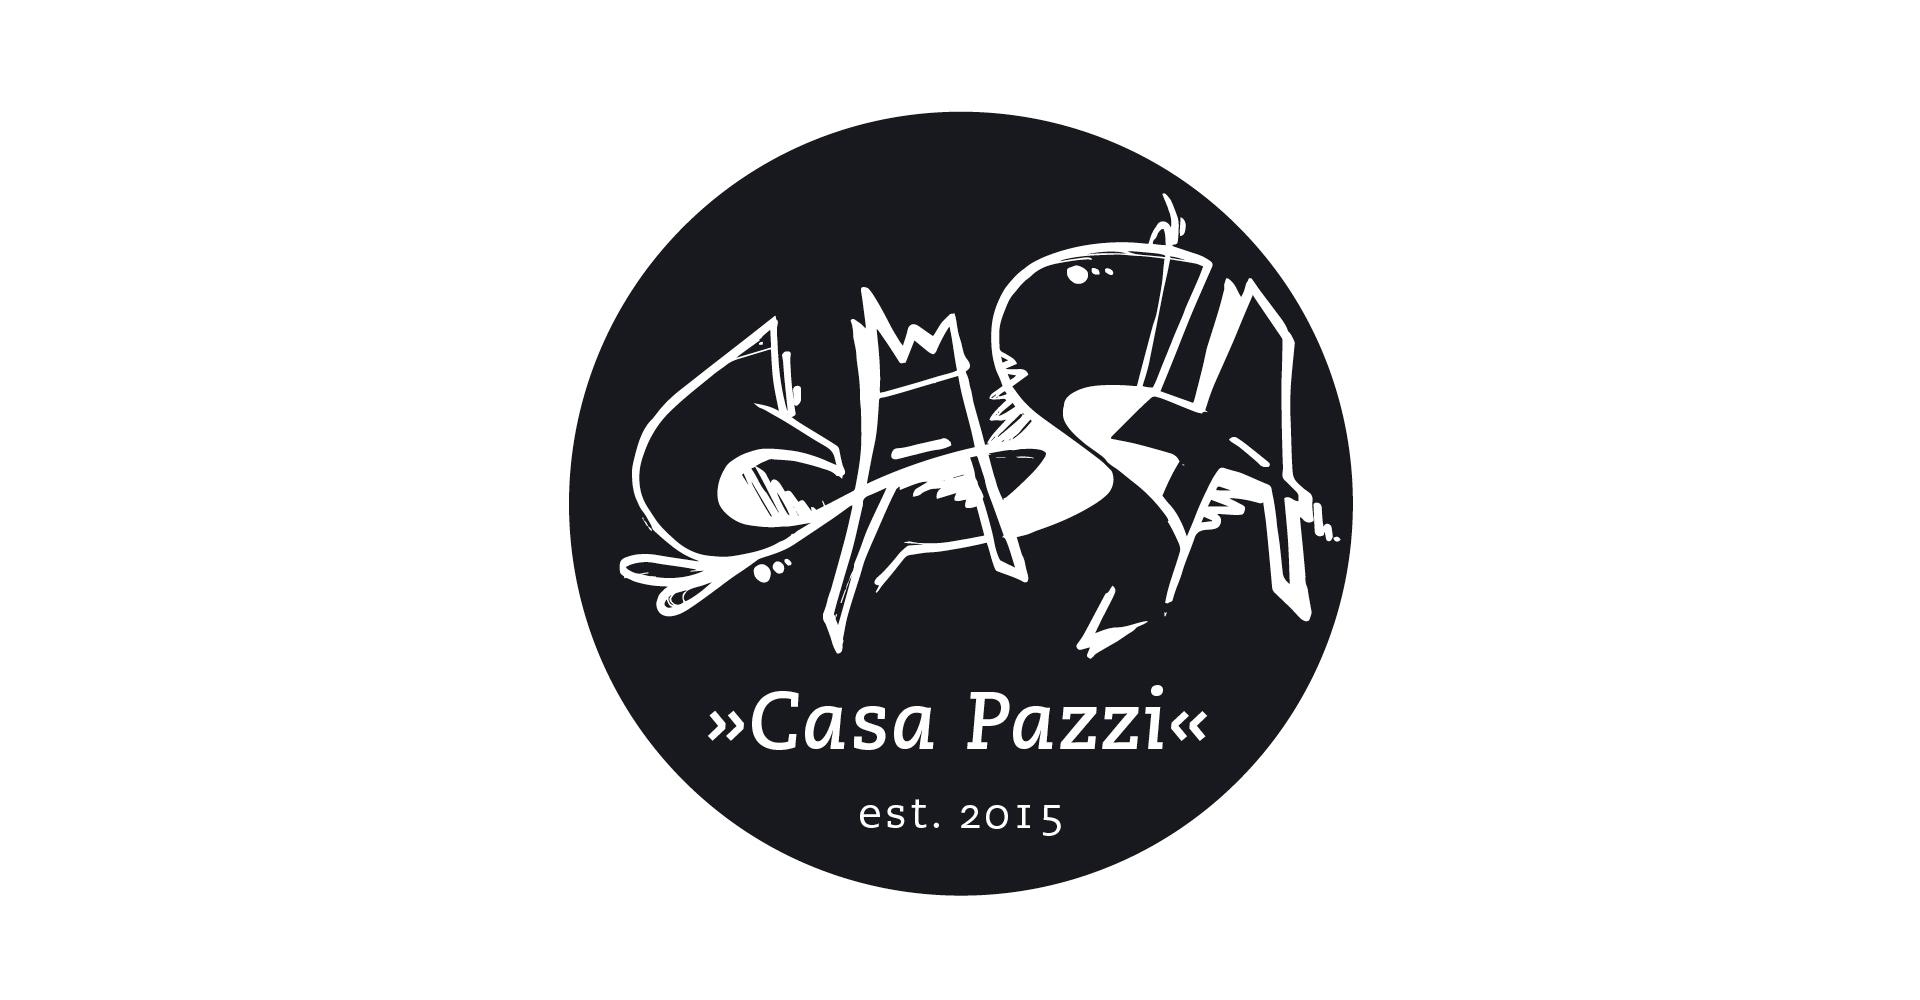 Logo-Design, Casa-Pazzi, Design, Logo, Münster, Grafik, Studio, Auckz